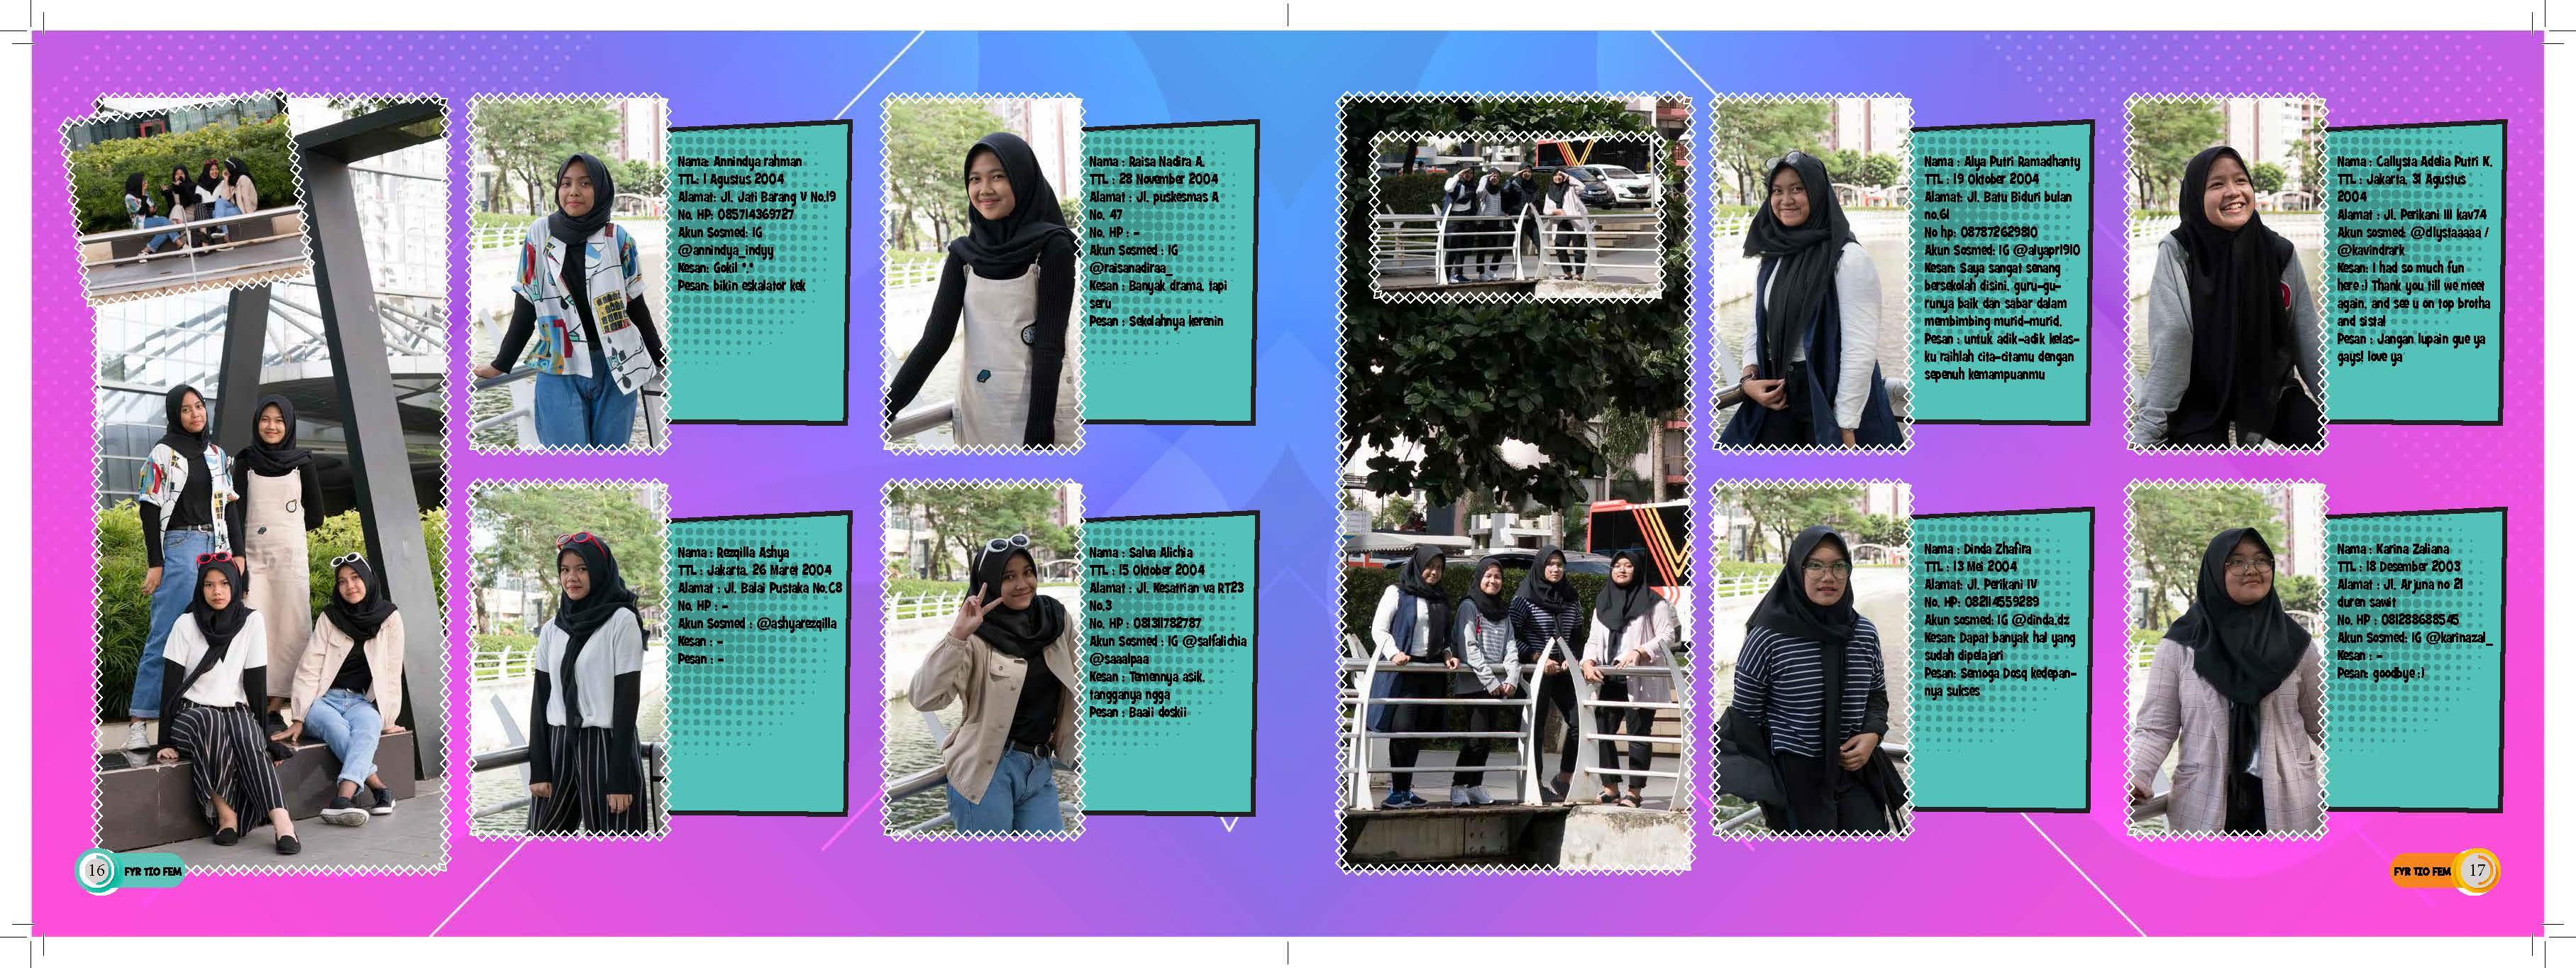 SMP 31 tahun 2019_Page_10